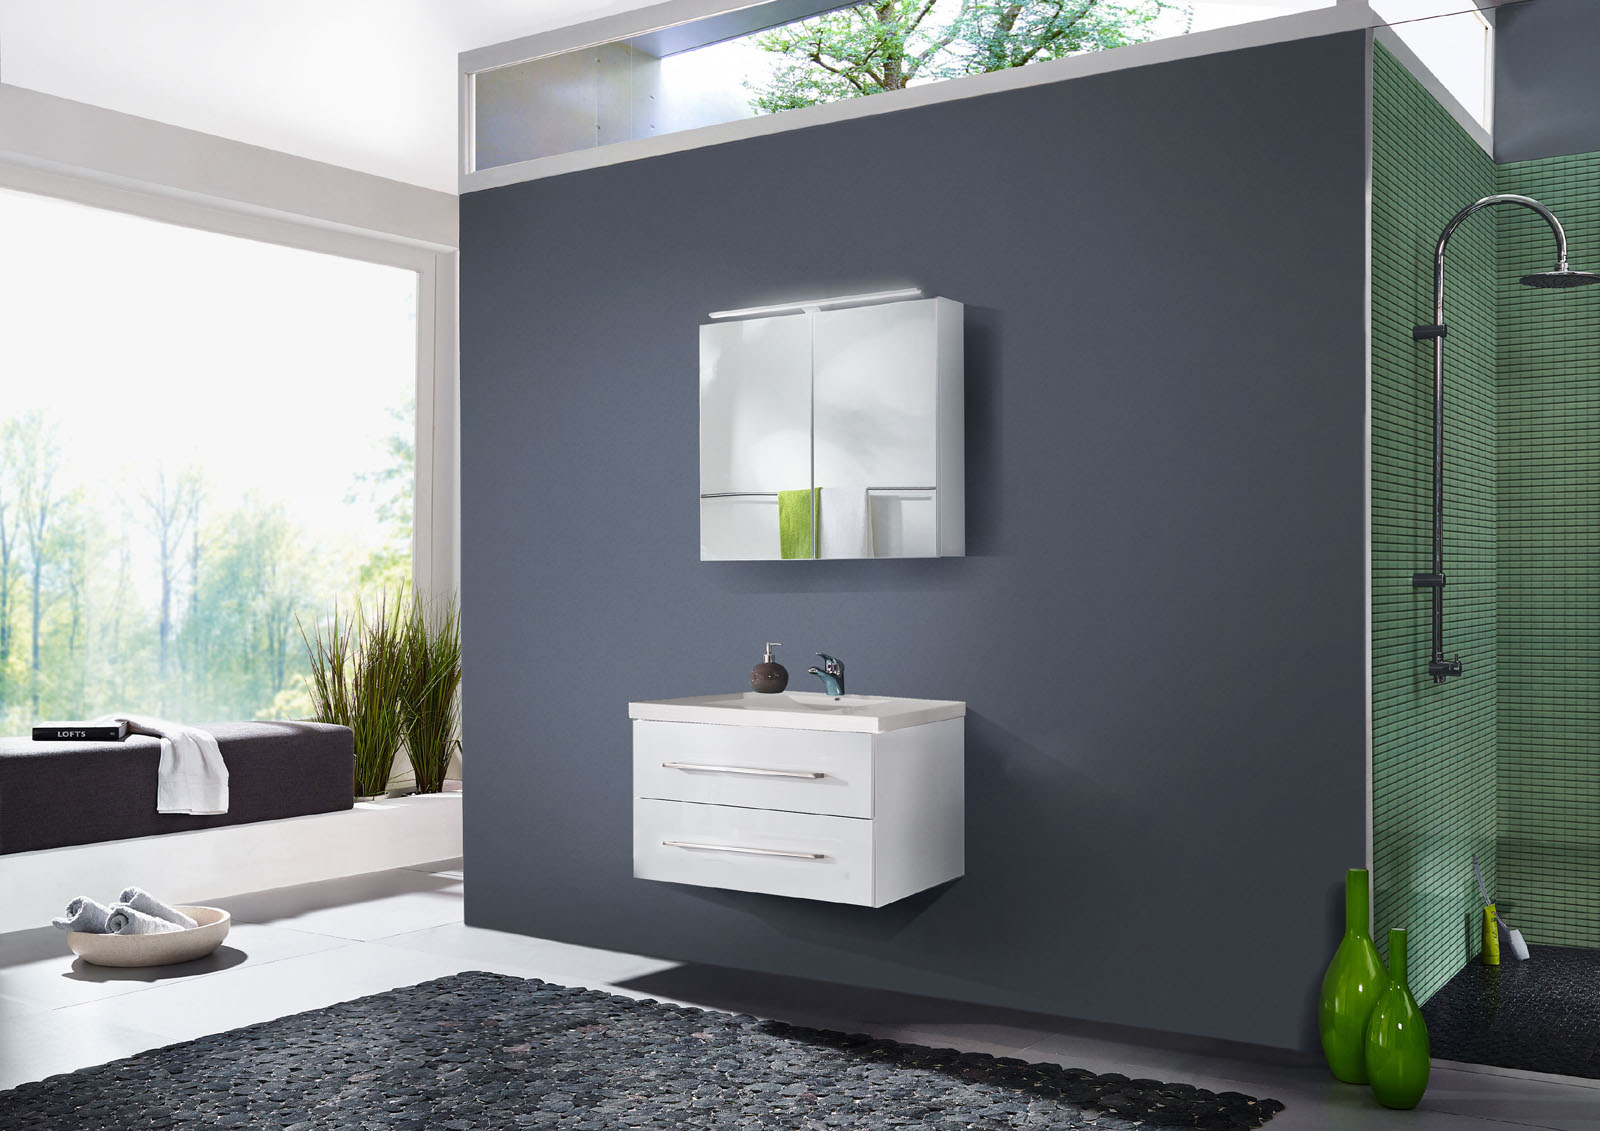 sale badezimmer set 2tlg weiß 90 cm dublin günstig, Badezimmer ideen